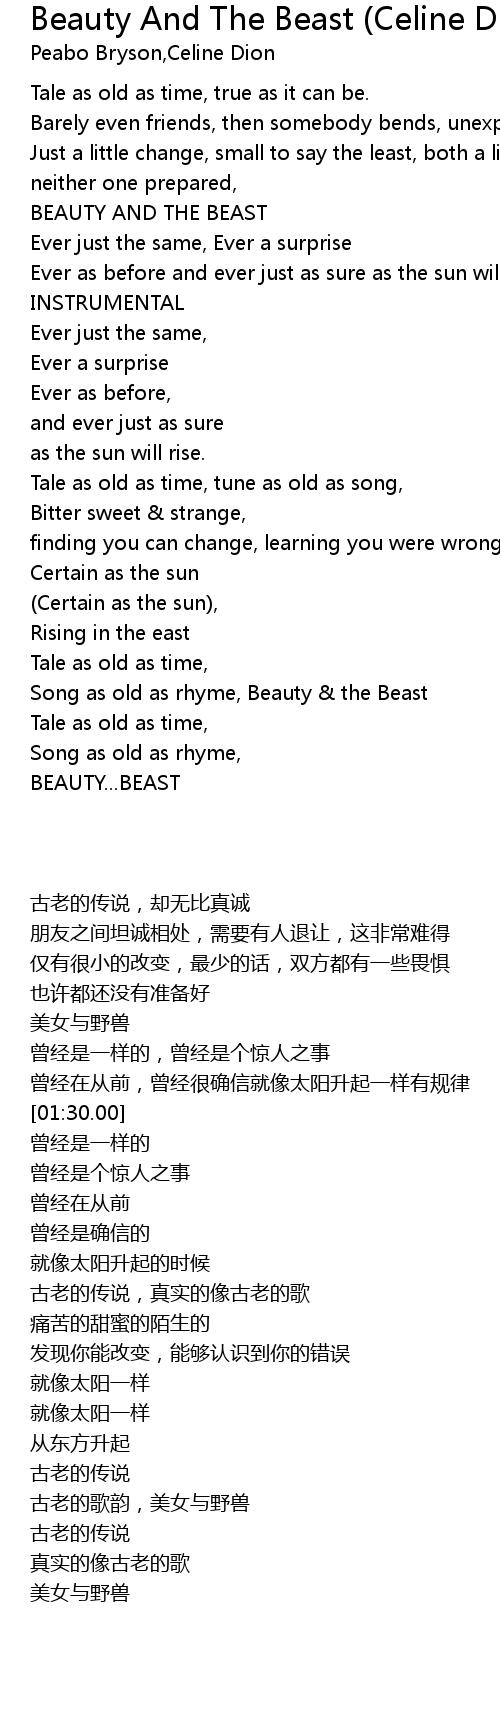 Beauty And The Beast Celine Dion And Peabo Bryson Lyrics Follow Lyrics